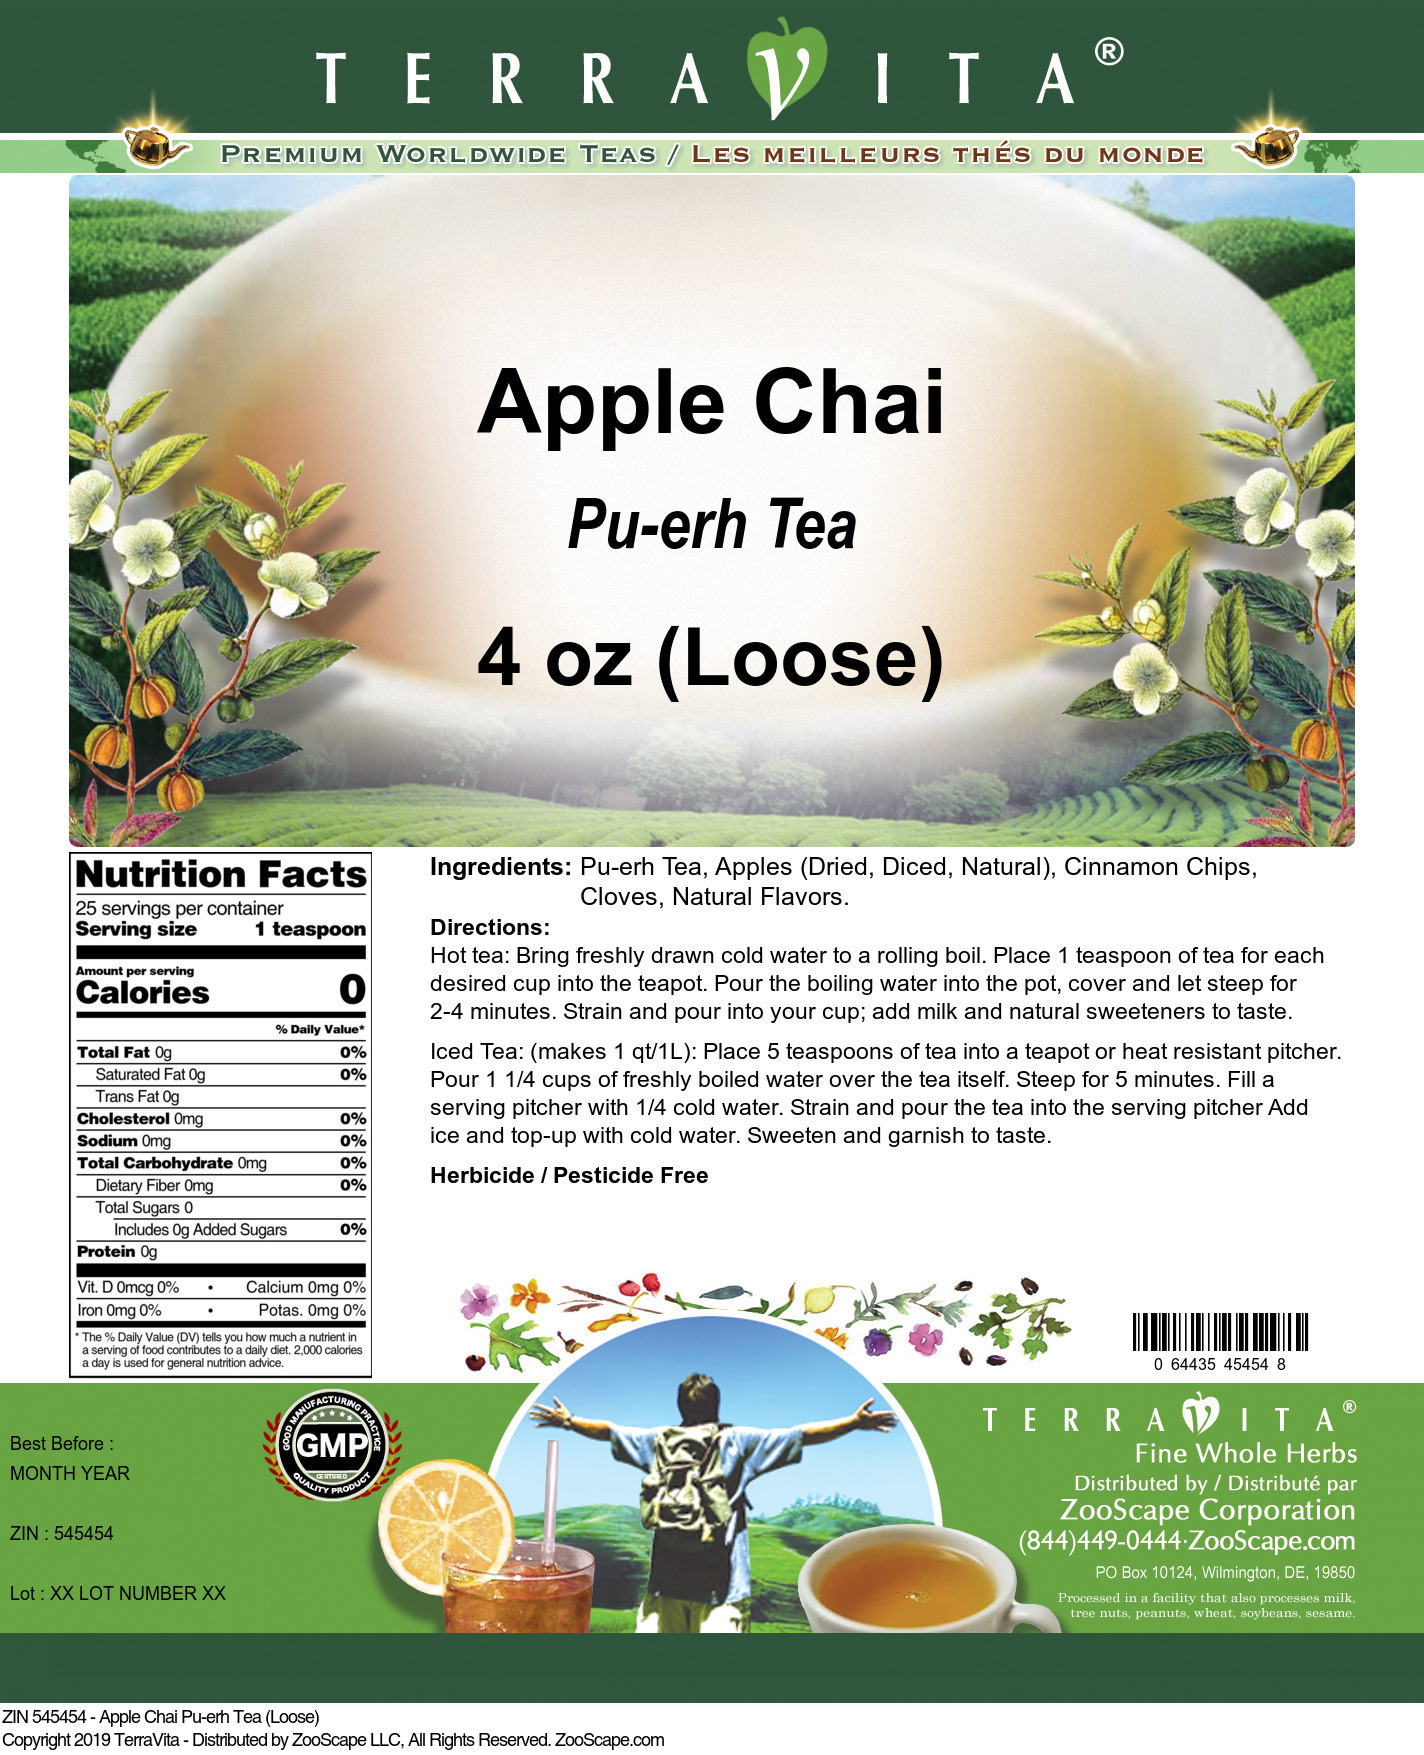 Apple Chai Pu-erh Tea